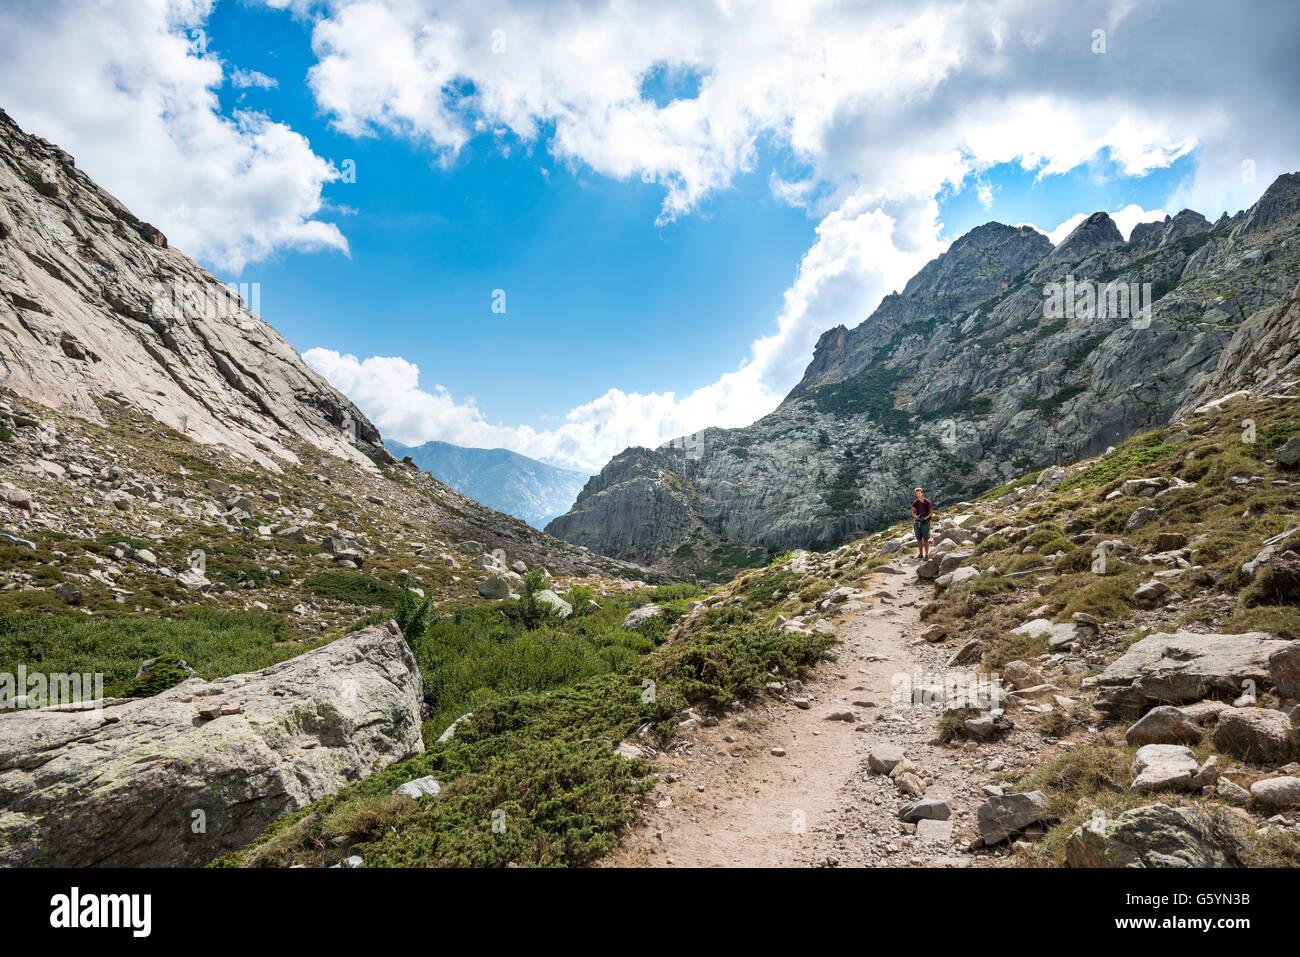 Junger Mann Wandern auf einem Pfad durch den Golo Tal Natur Naturpark von Korsika, Parc Naturel Régional de Stockbild